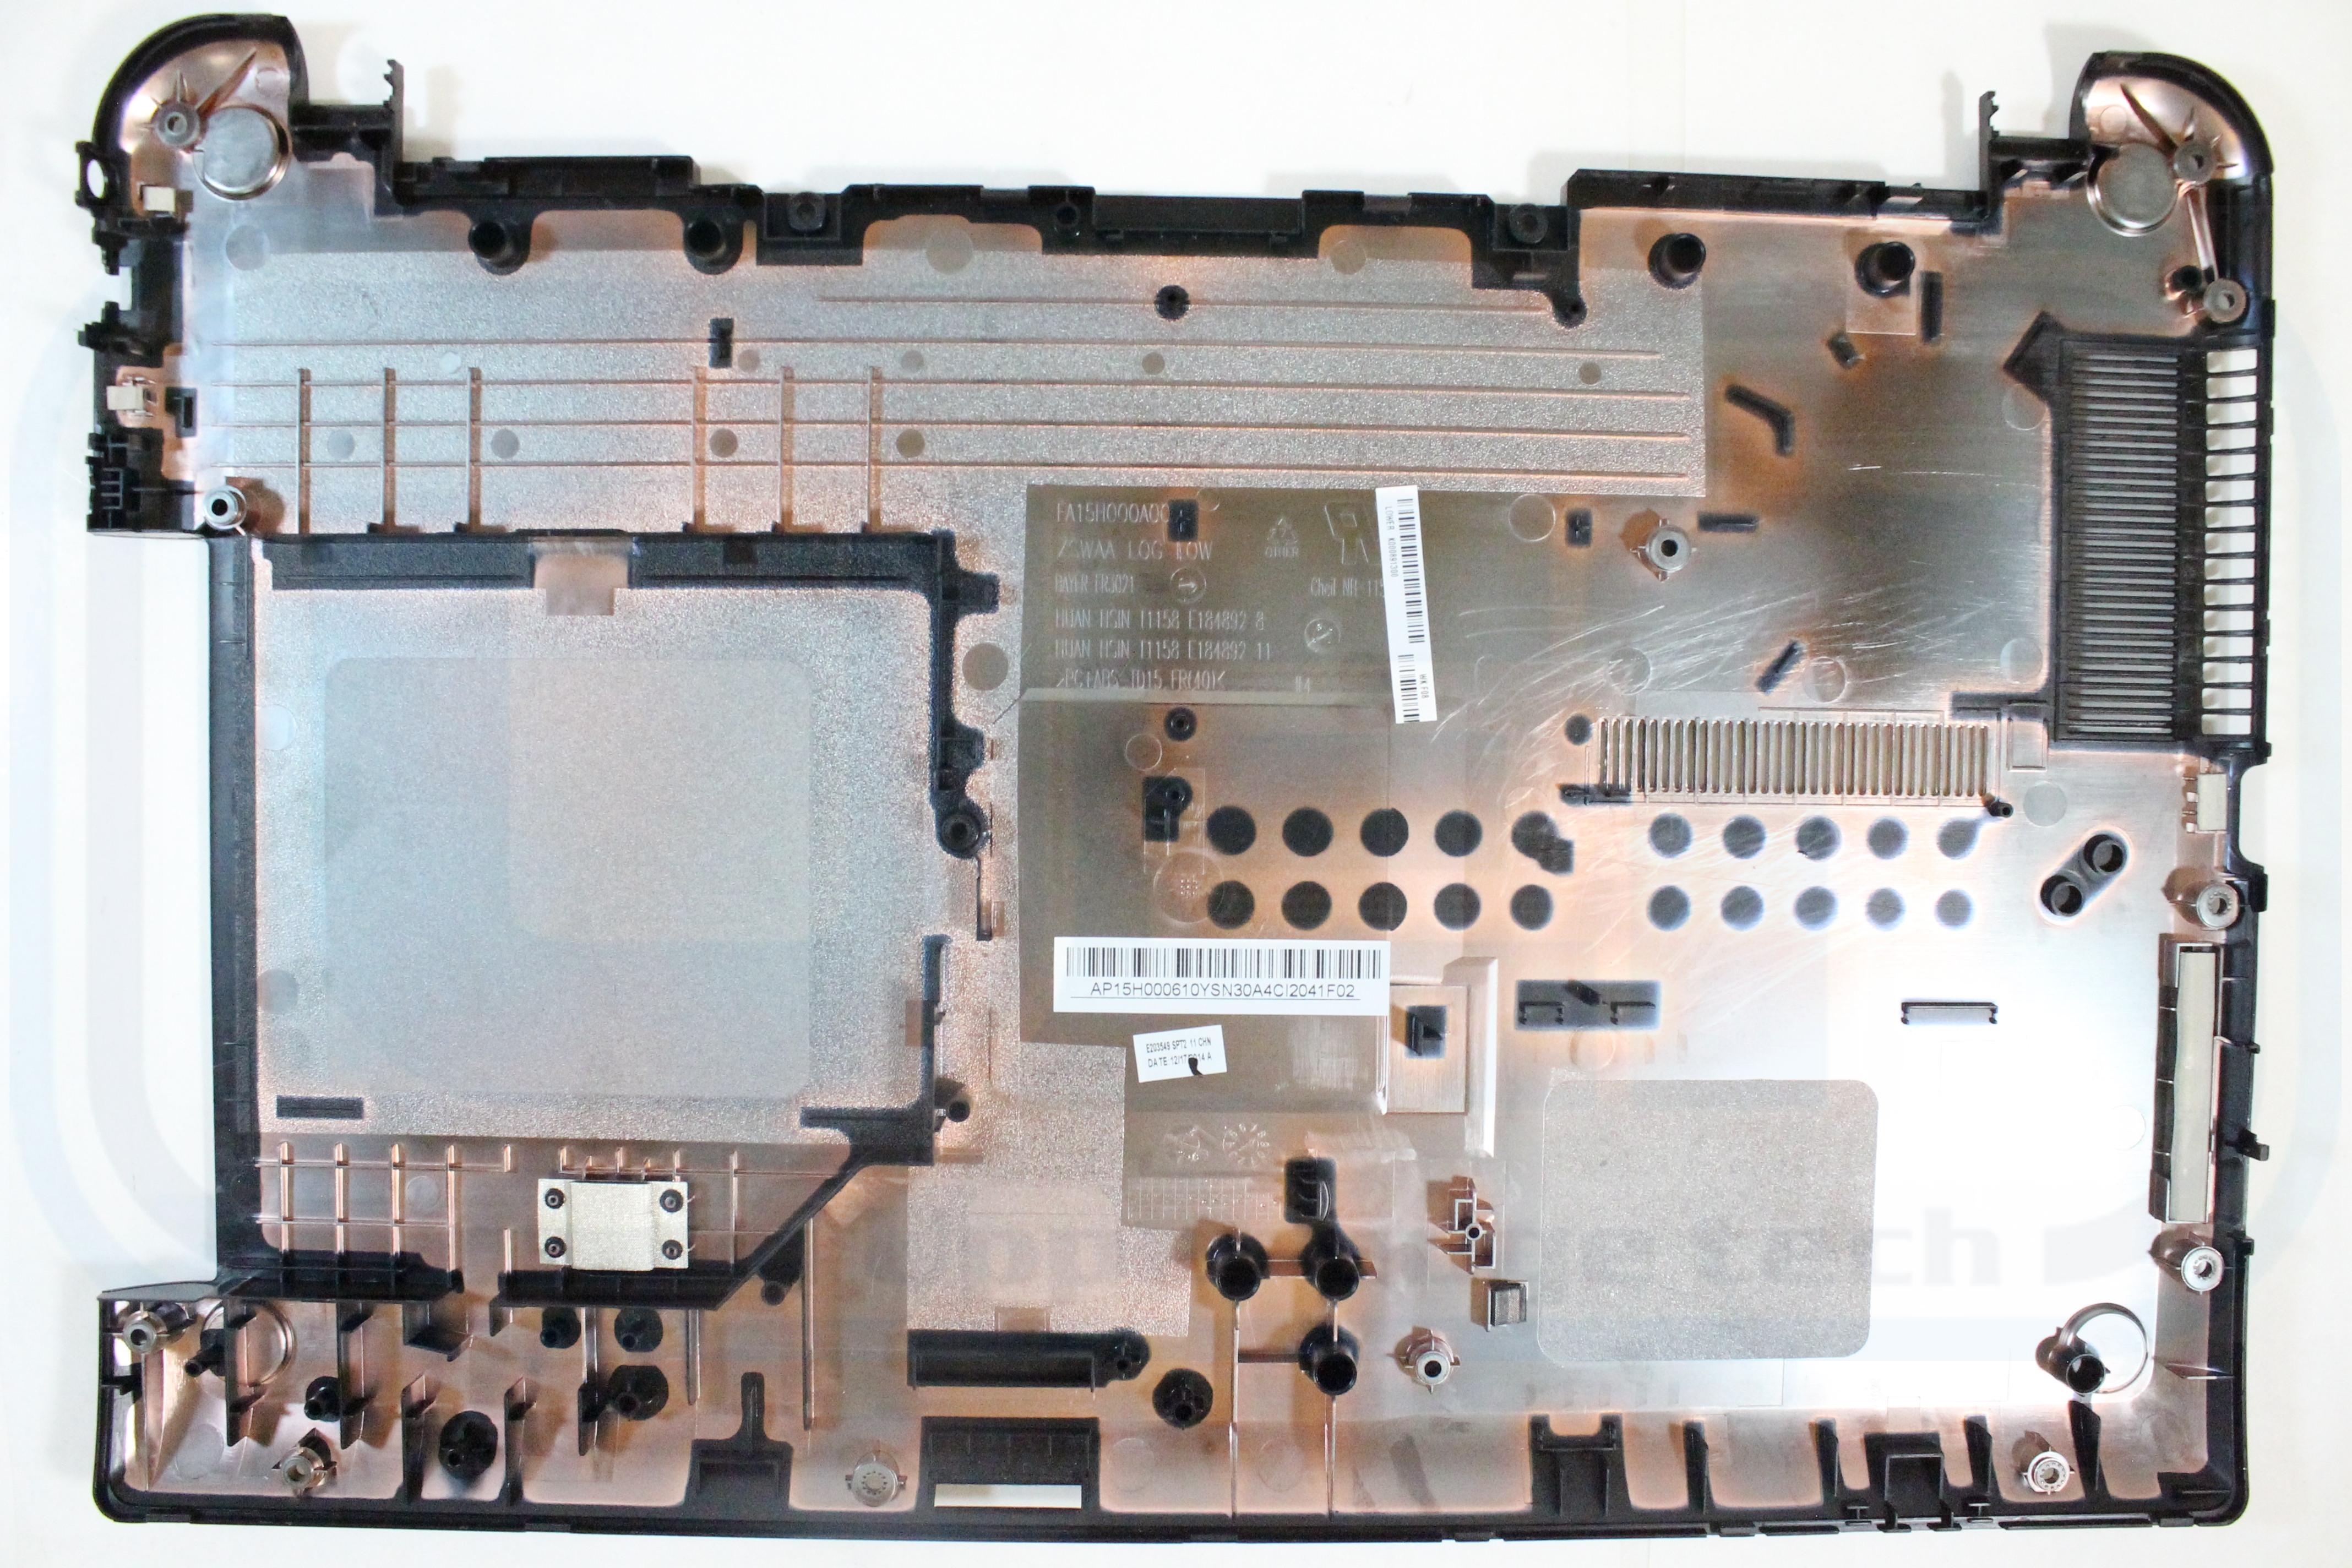 K000891300 C55-B5299 Cover TOSHIBA Satellite C55 Series Laptop Bottom CASE